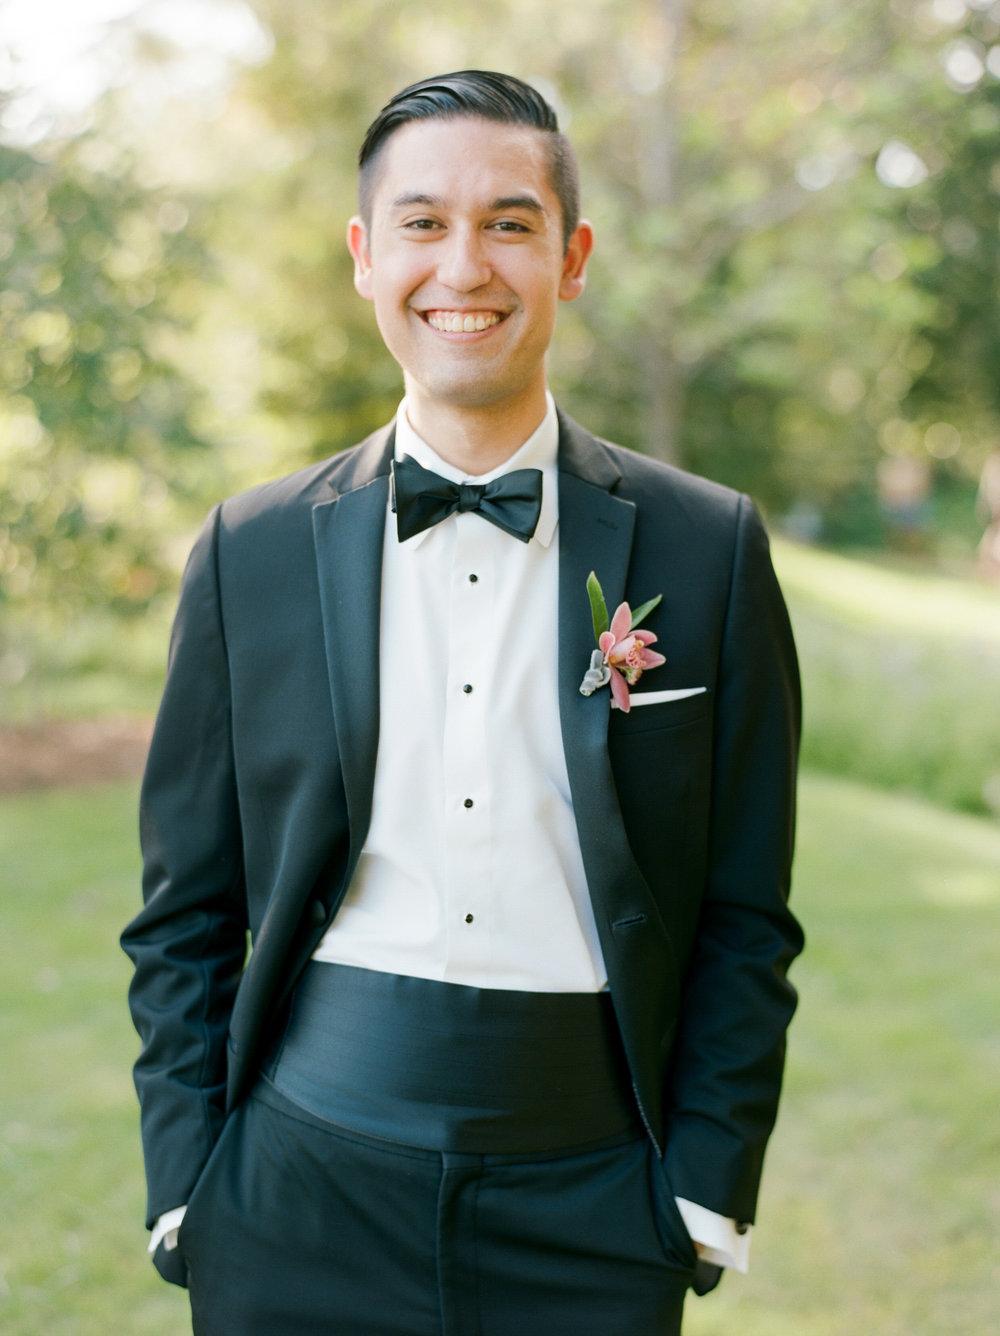 The-Knot-Texas-Magazine-Wedding-Top-Best-Houston-Wedding-Photographer-Fine-Art-Film-Dana-Fernandez-Photography-102.jpg